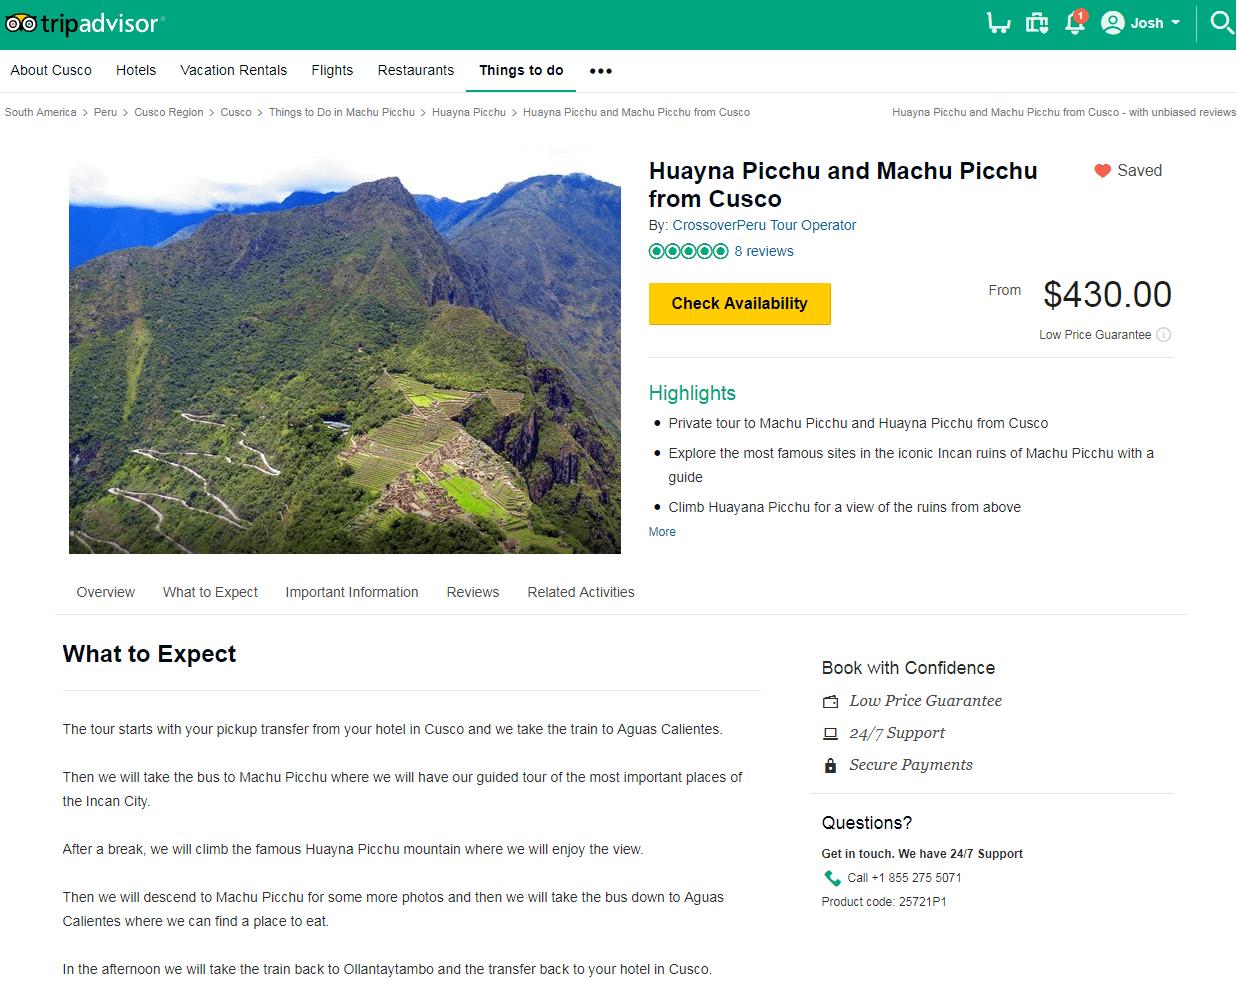 Huayna Picchu and Machu Picchu from Cusco.png